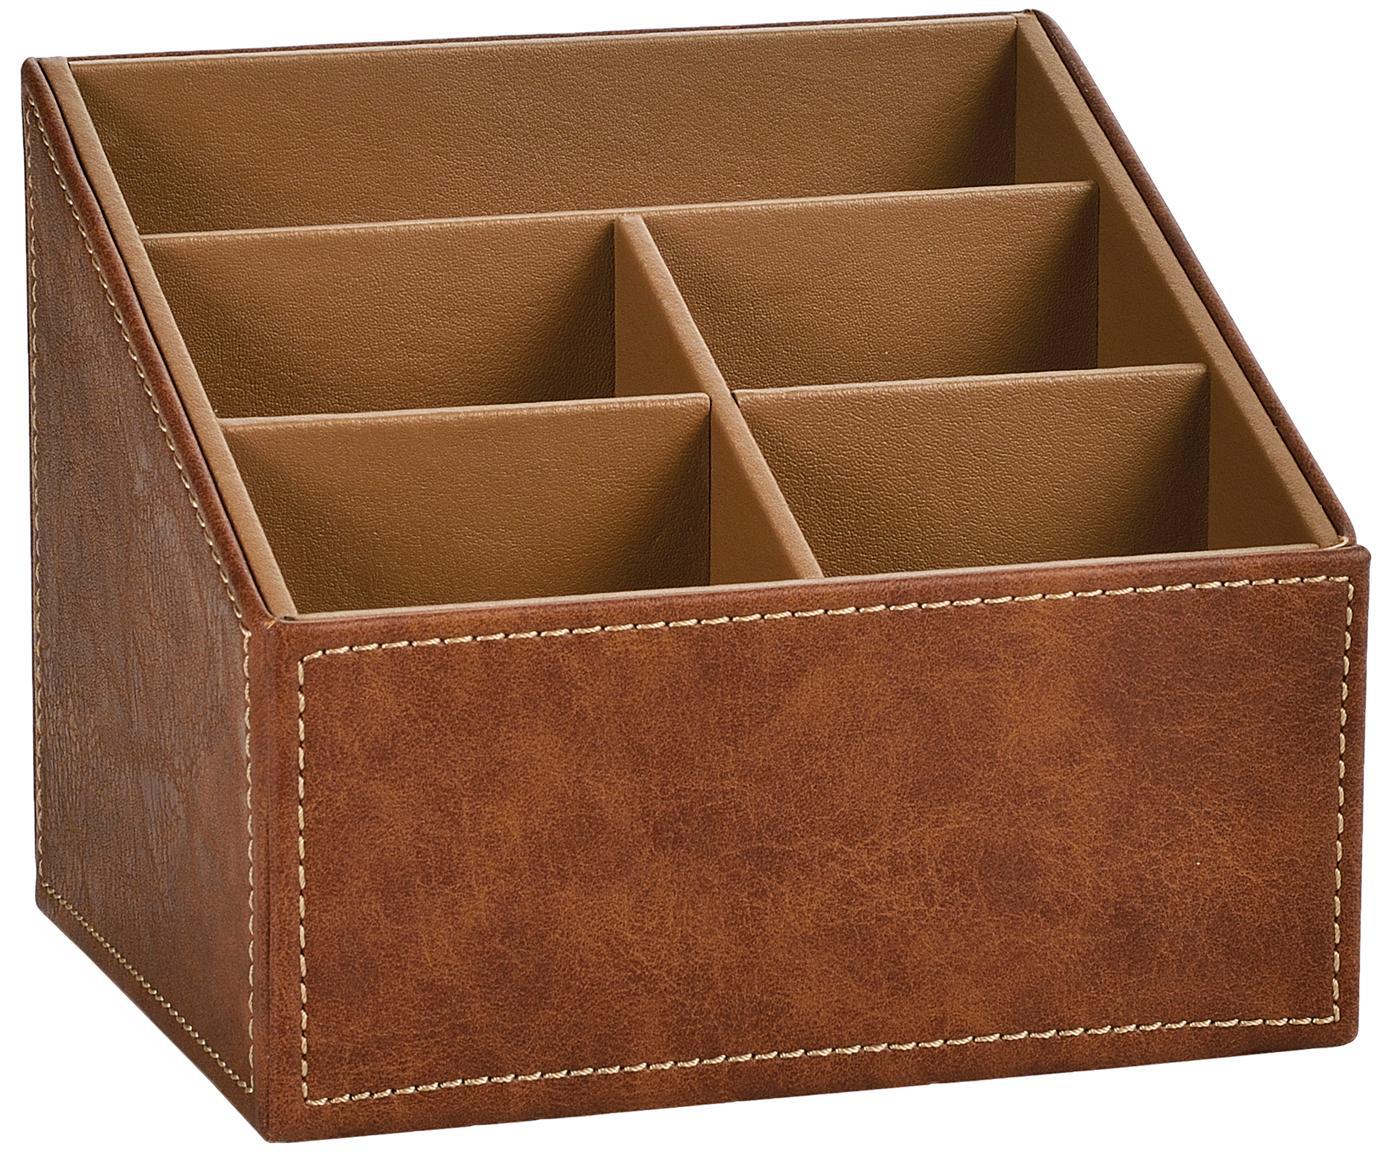 Bureau-organizer Storage, Bekleding: polyurethaan (kunstleer), Frame: MDF, Bruin, 17 x 13 cm